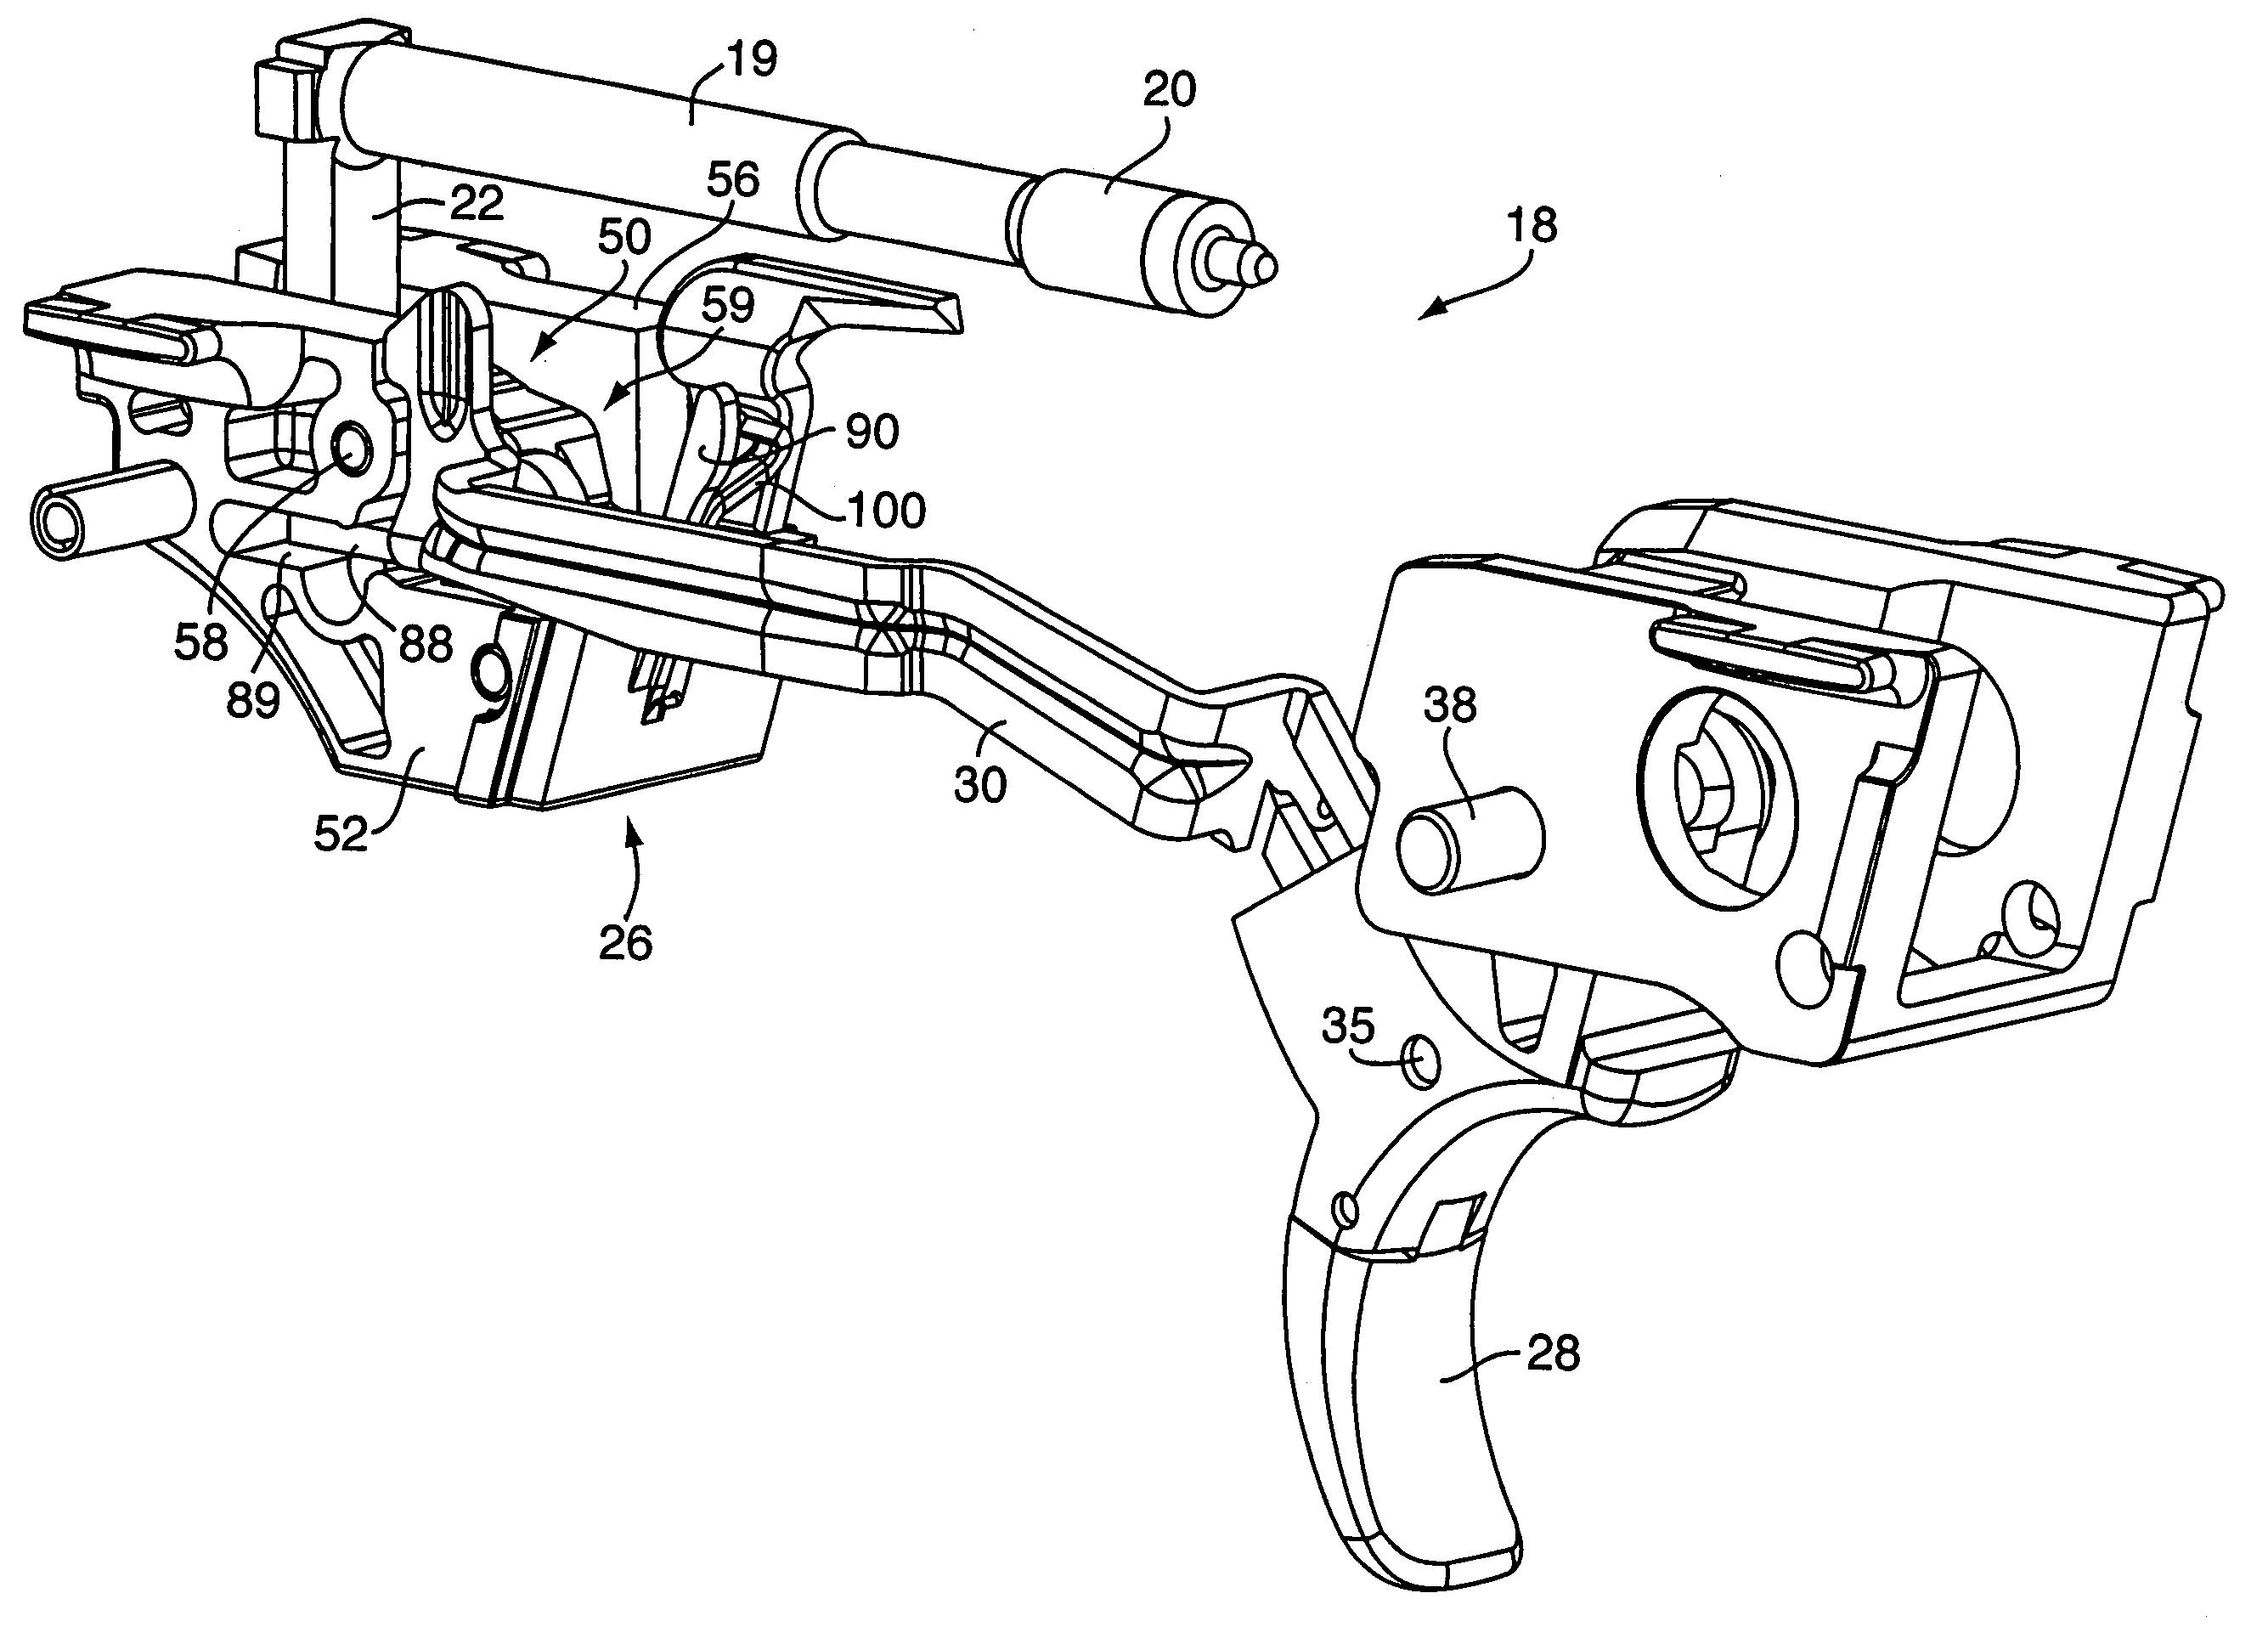 glock 17 parts diagram sketch coloring page. Black Bedroom Furniture Sets. Home Design Ideas